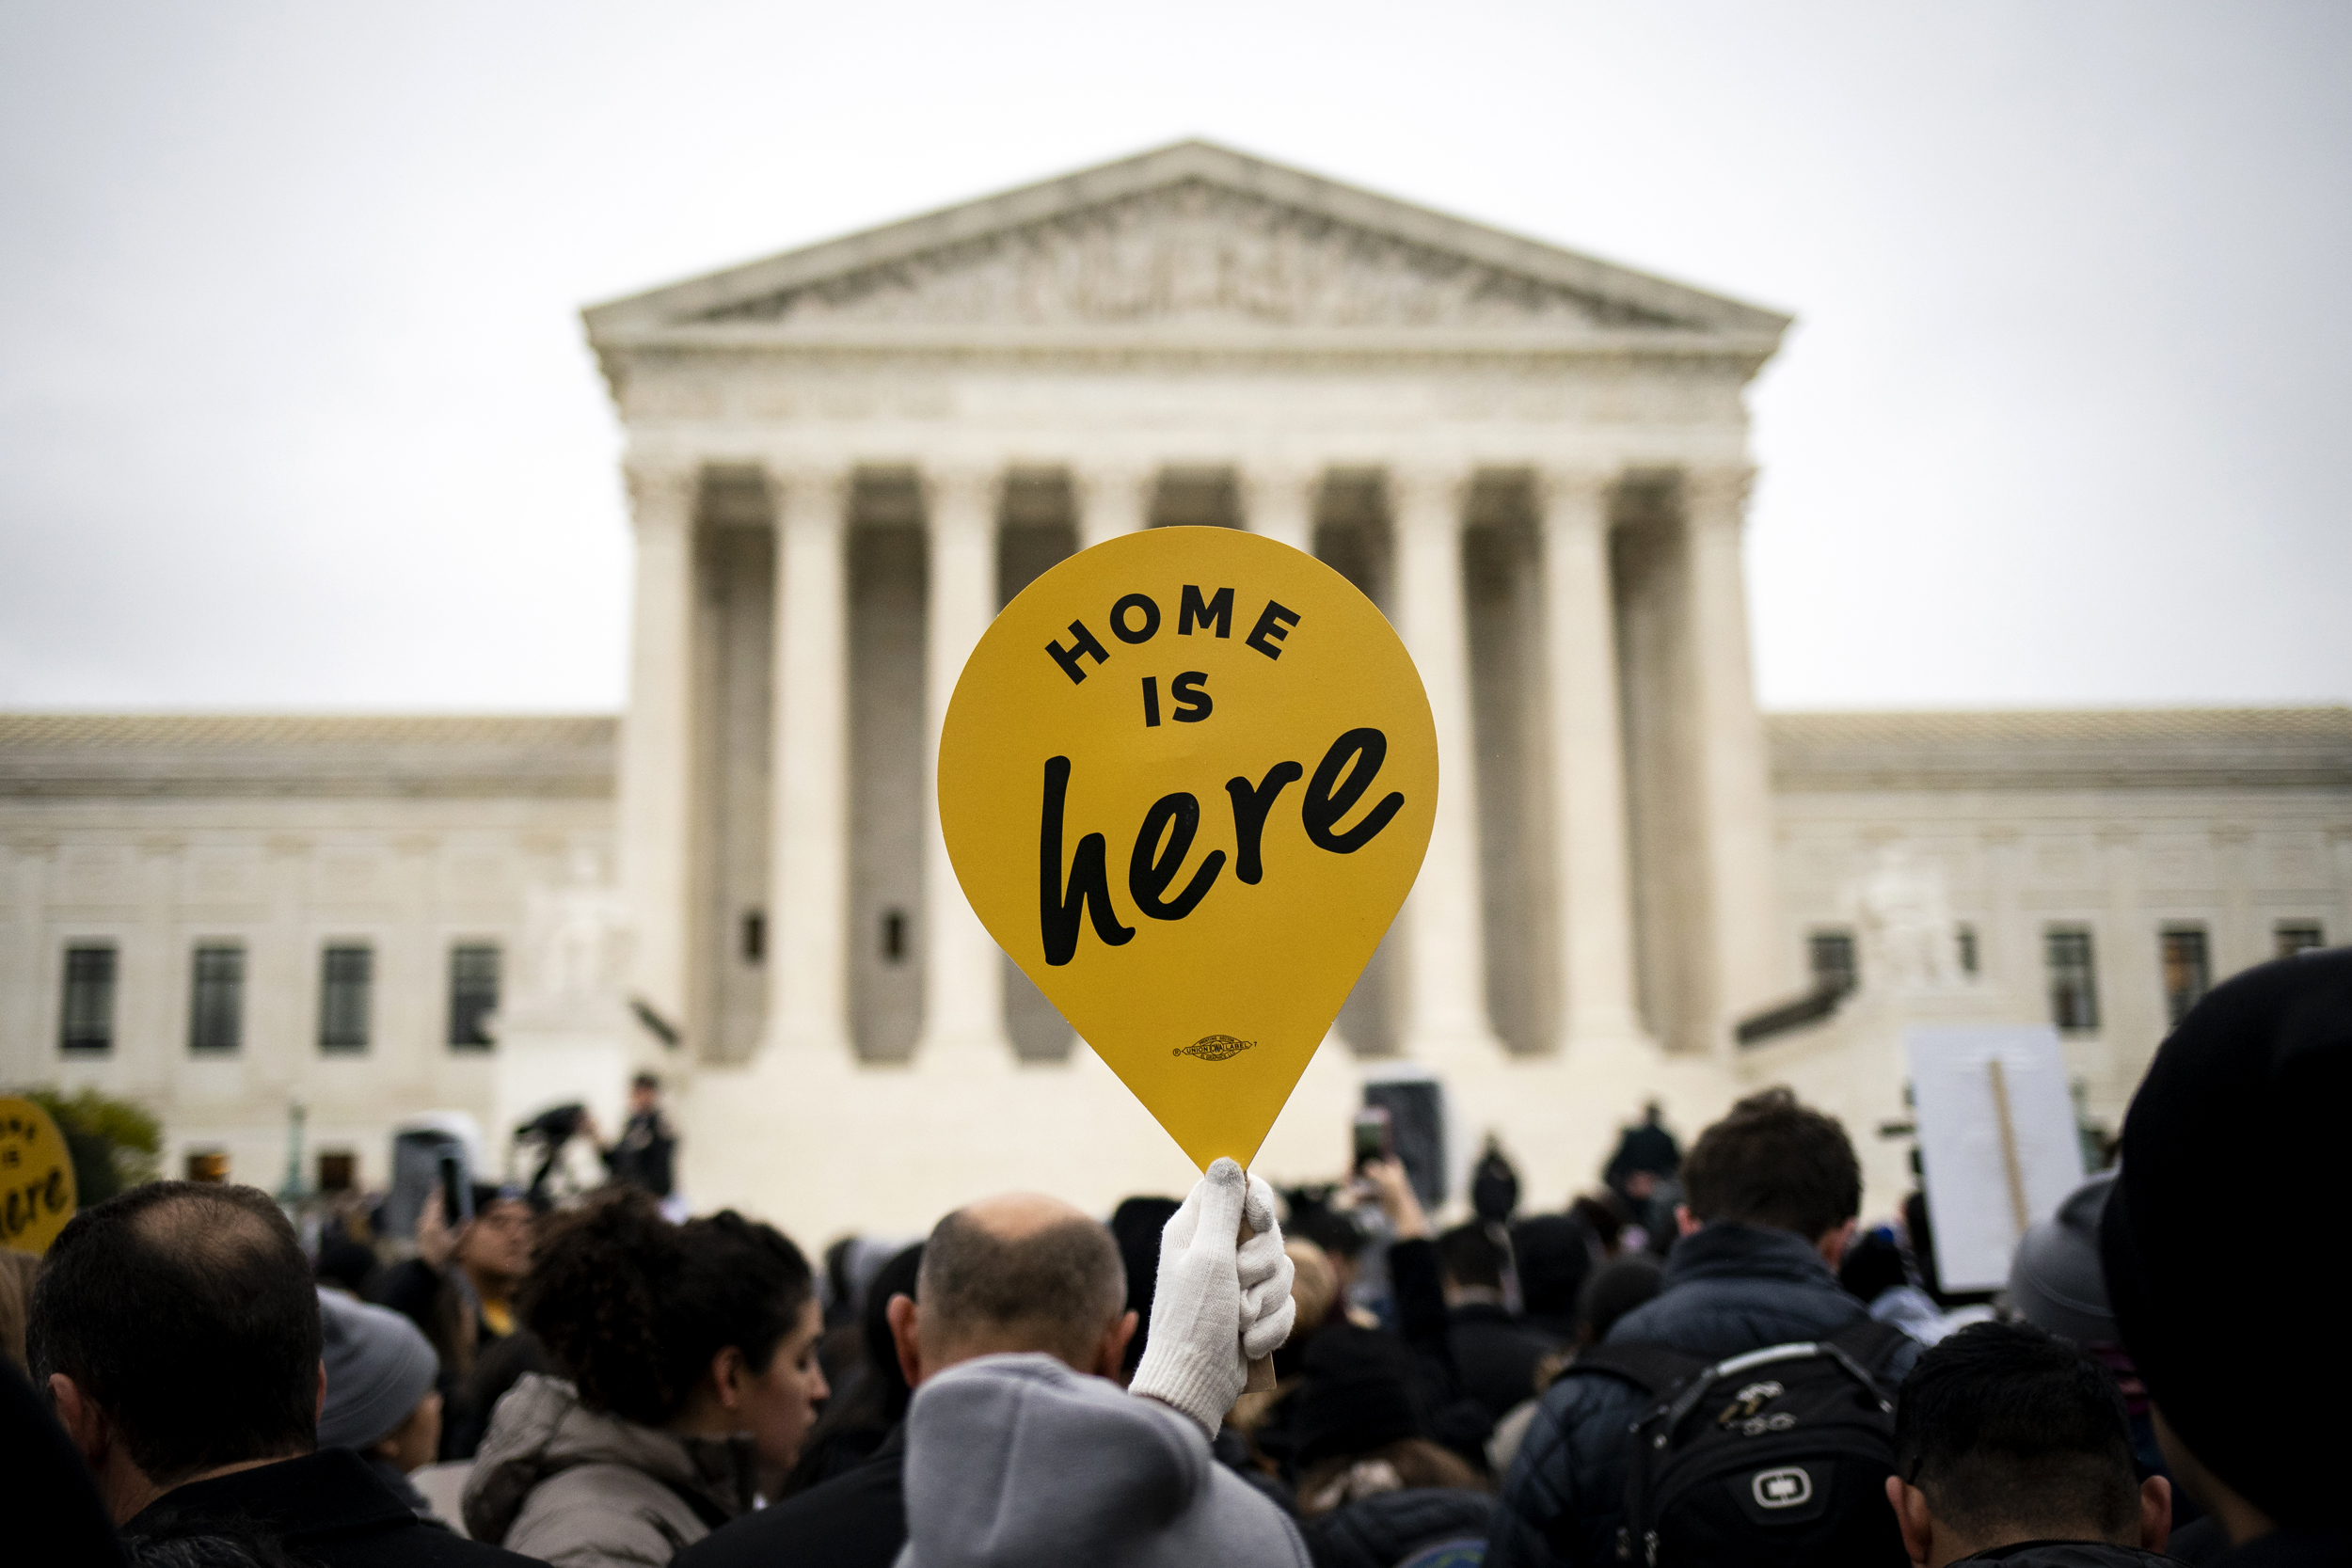 NAPCA Praises SCOTUS' Decision to Uphold DACA